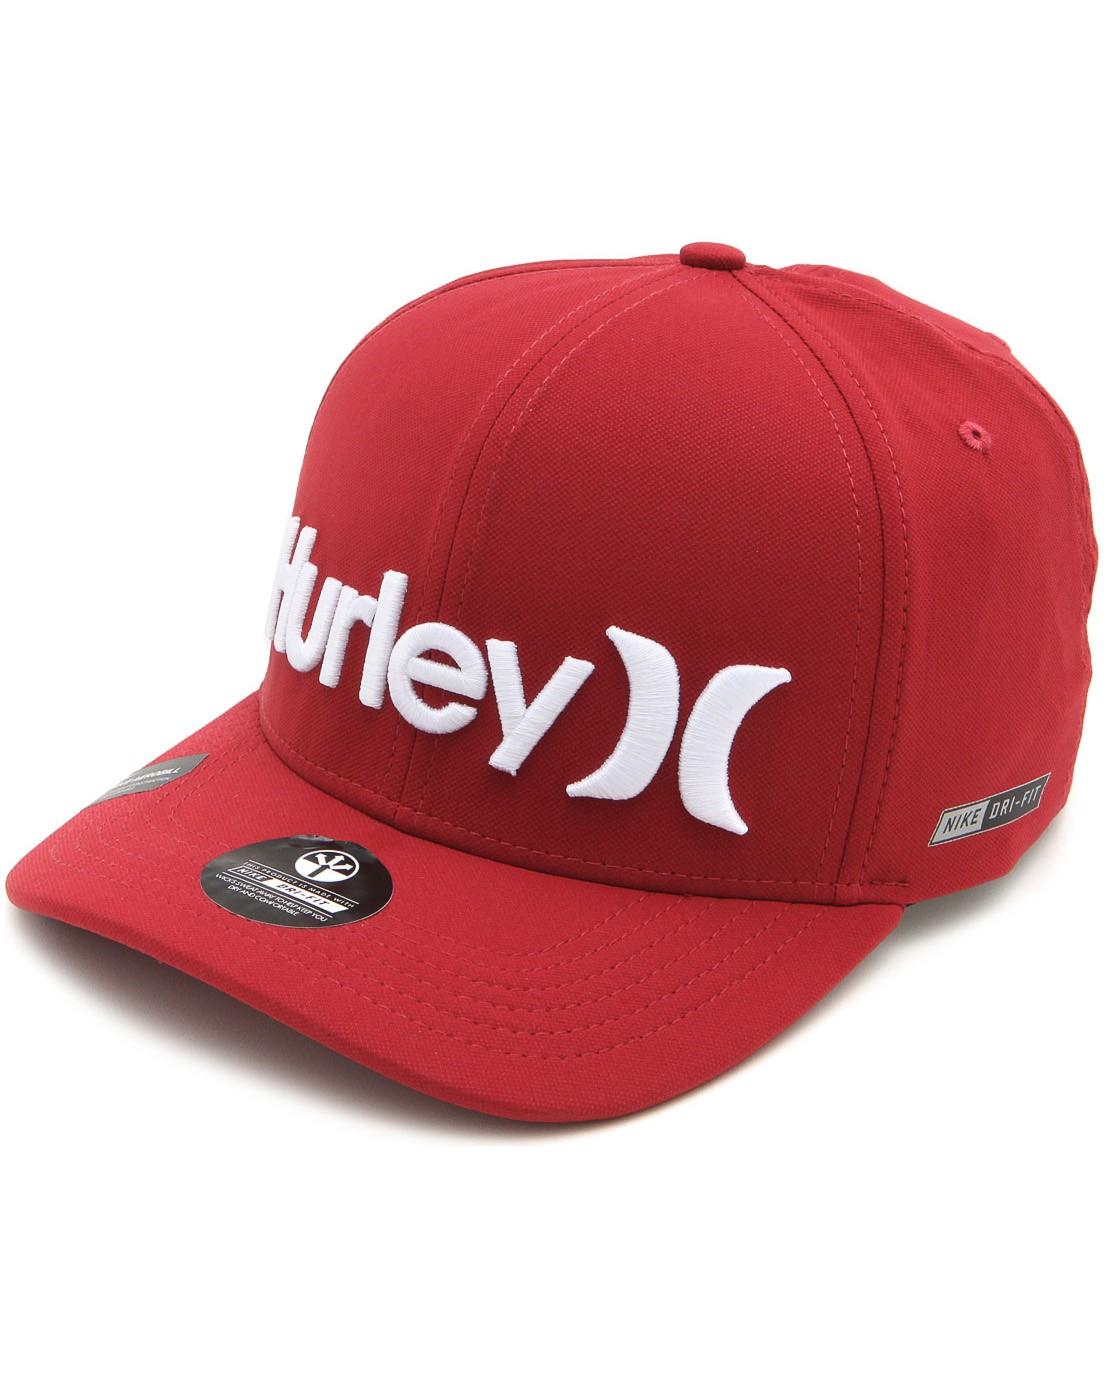 Boné Hurley Only Nike Dri-Fit